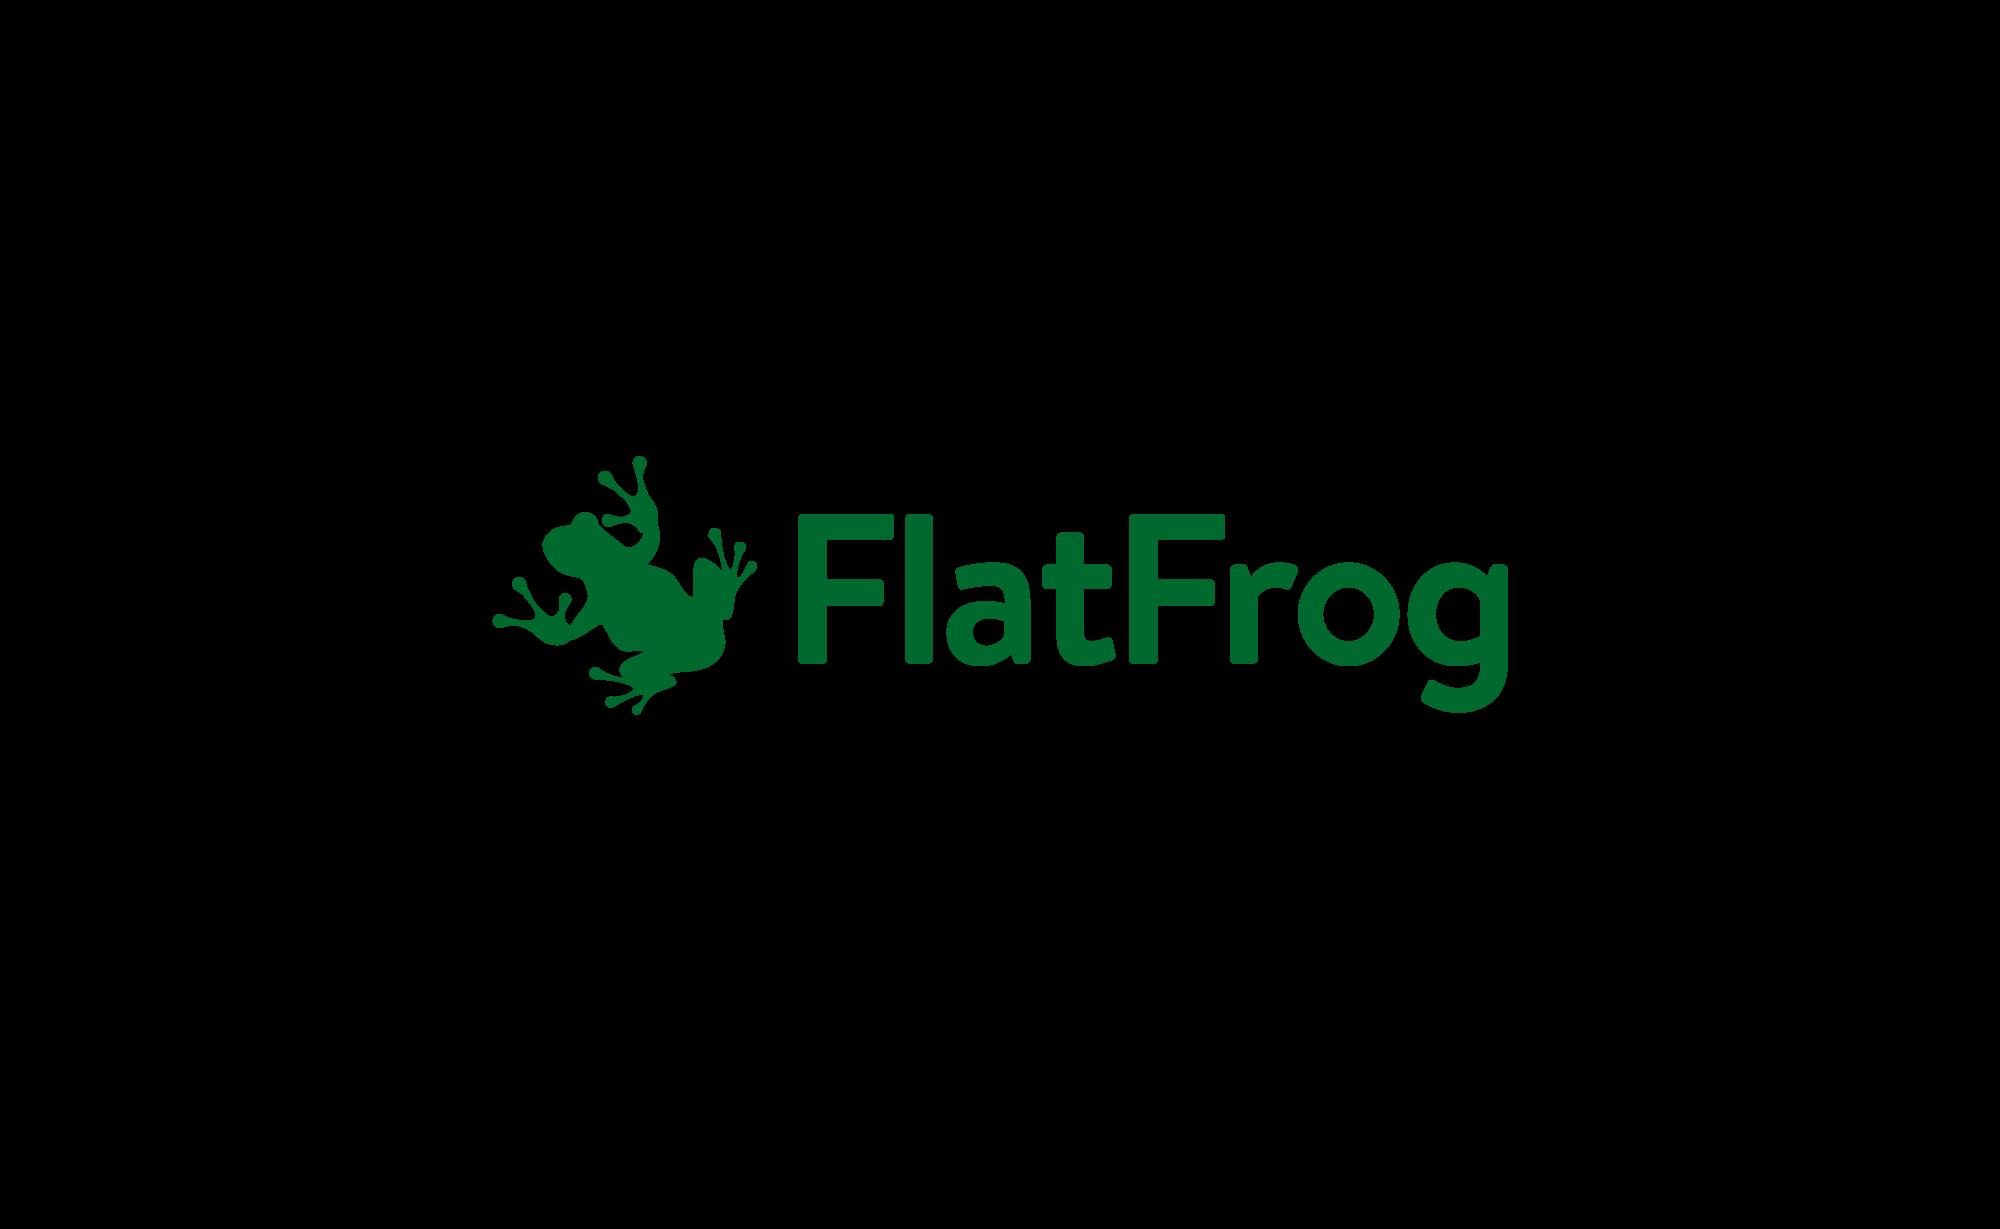 FlatFrog Files Lawsuit Against Promethean Ltd and Promethean Inc